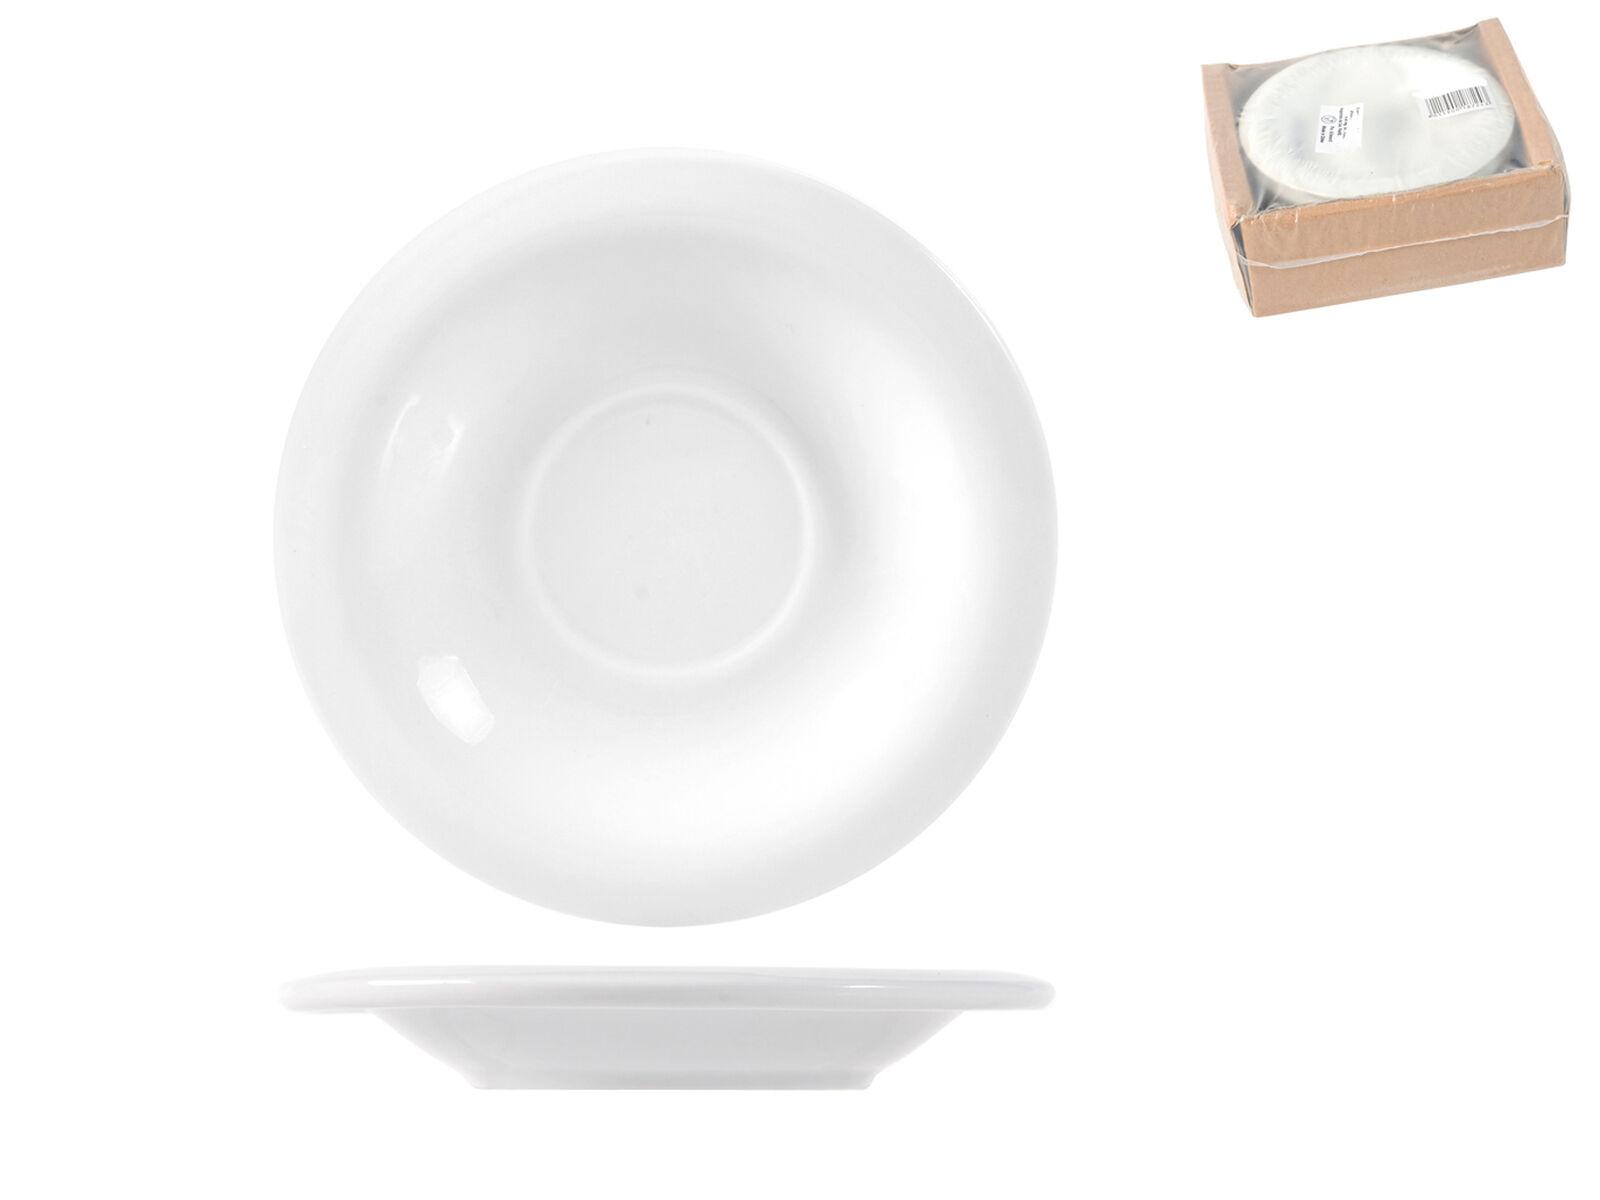 PANFILI Confezione 6 piattini per tazzine tè porcellana pisa